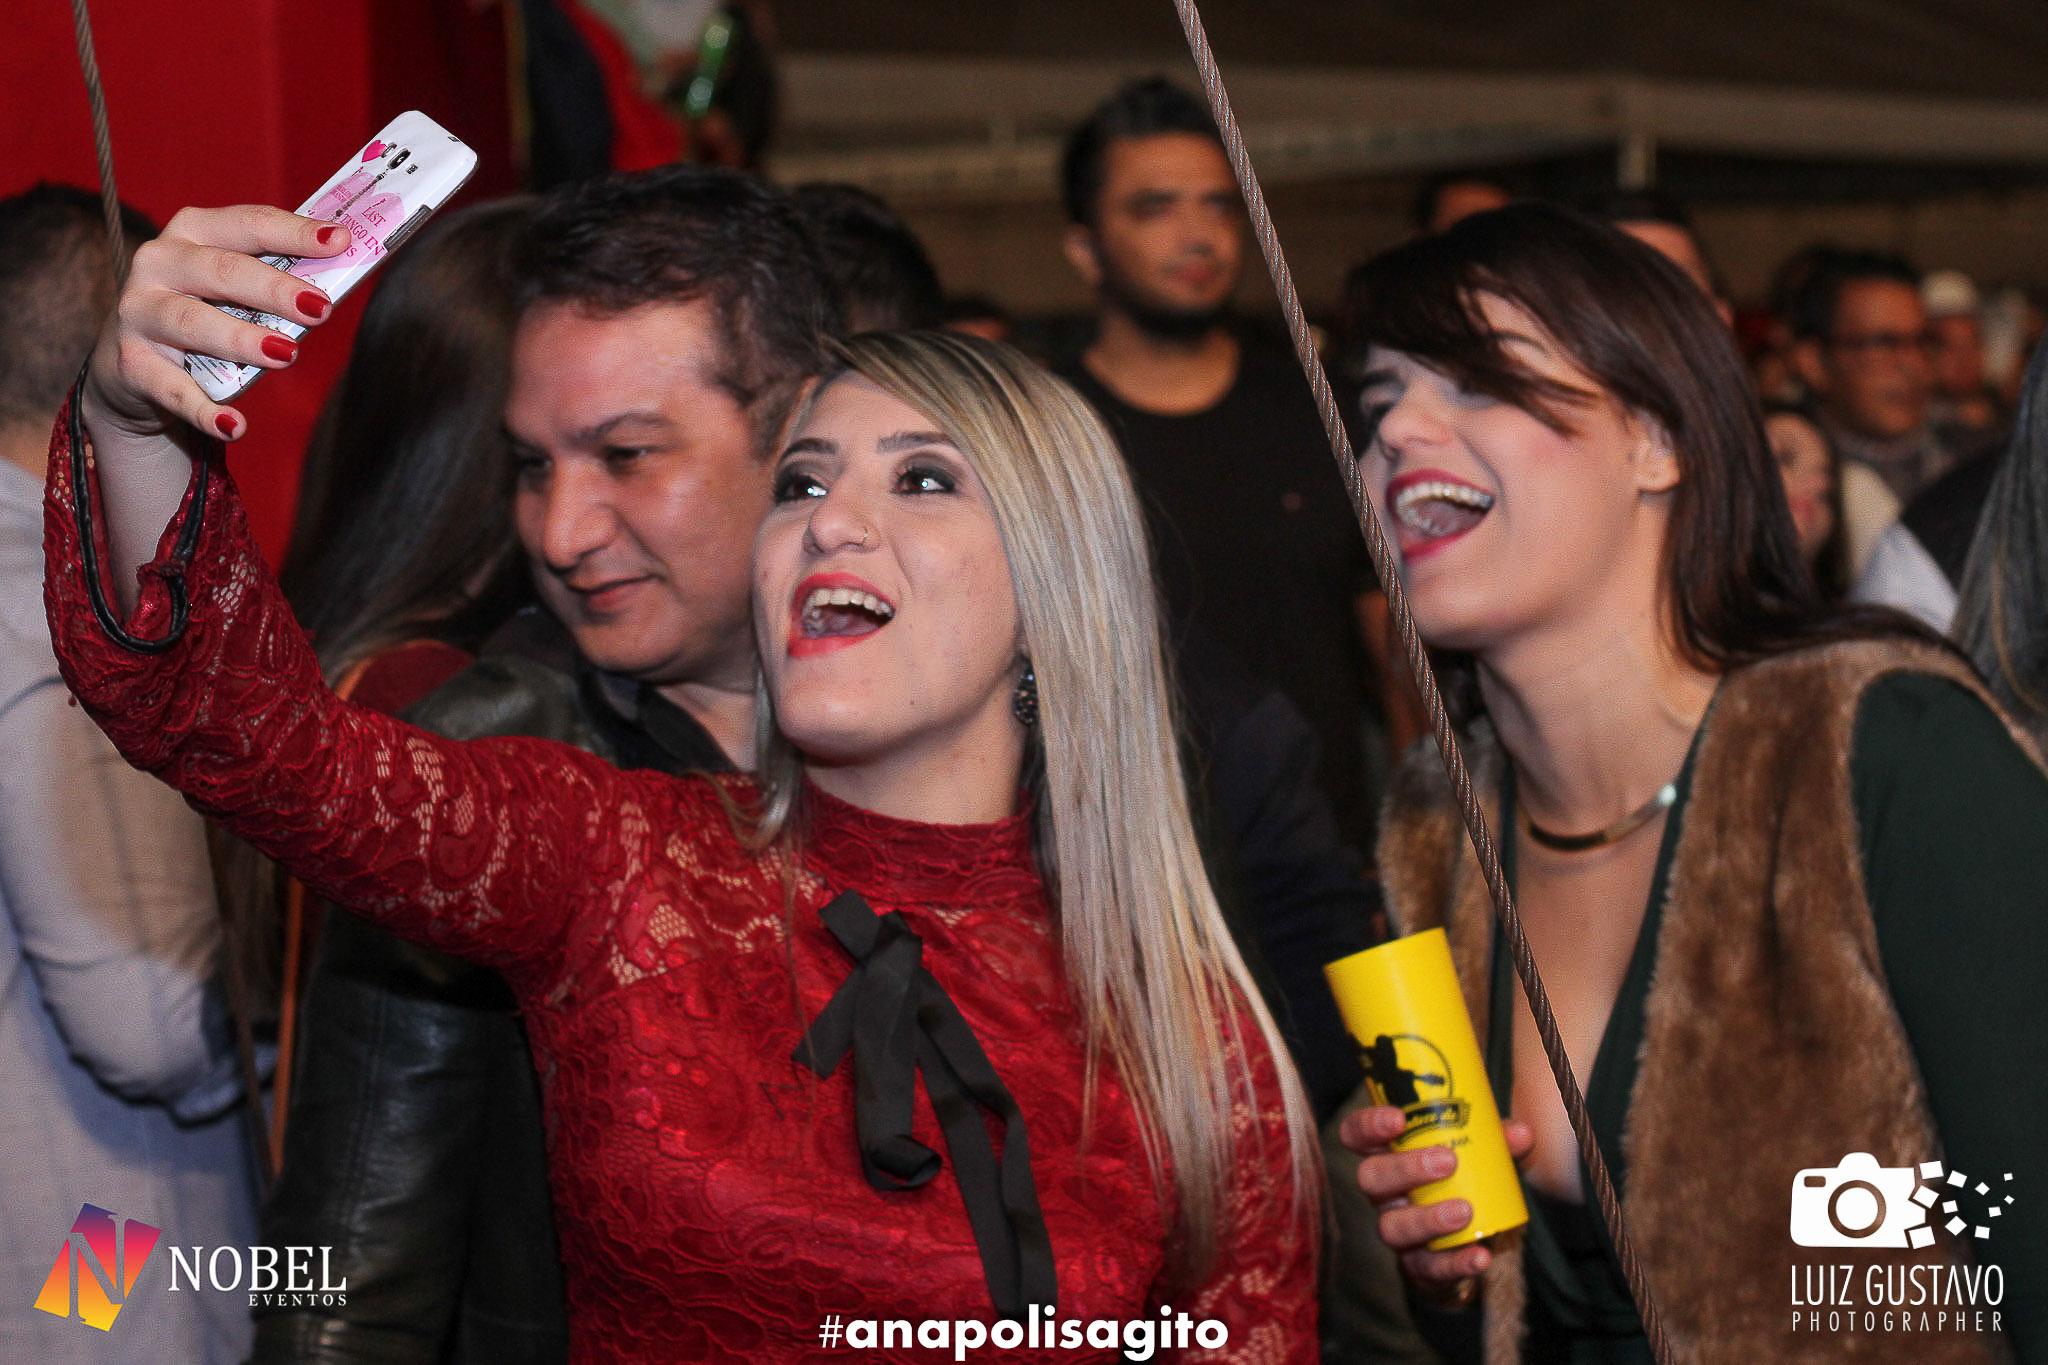 Luiz Gustavo Photographer-58